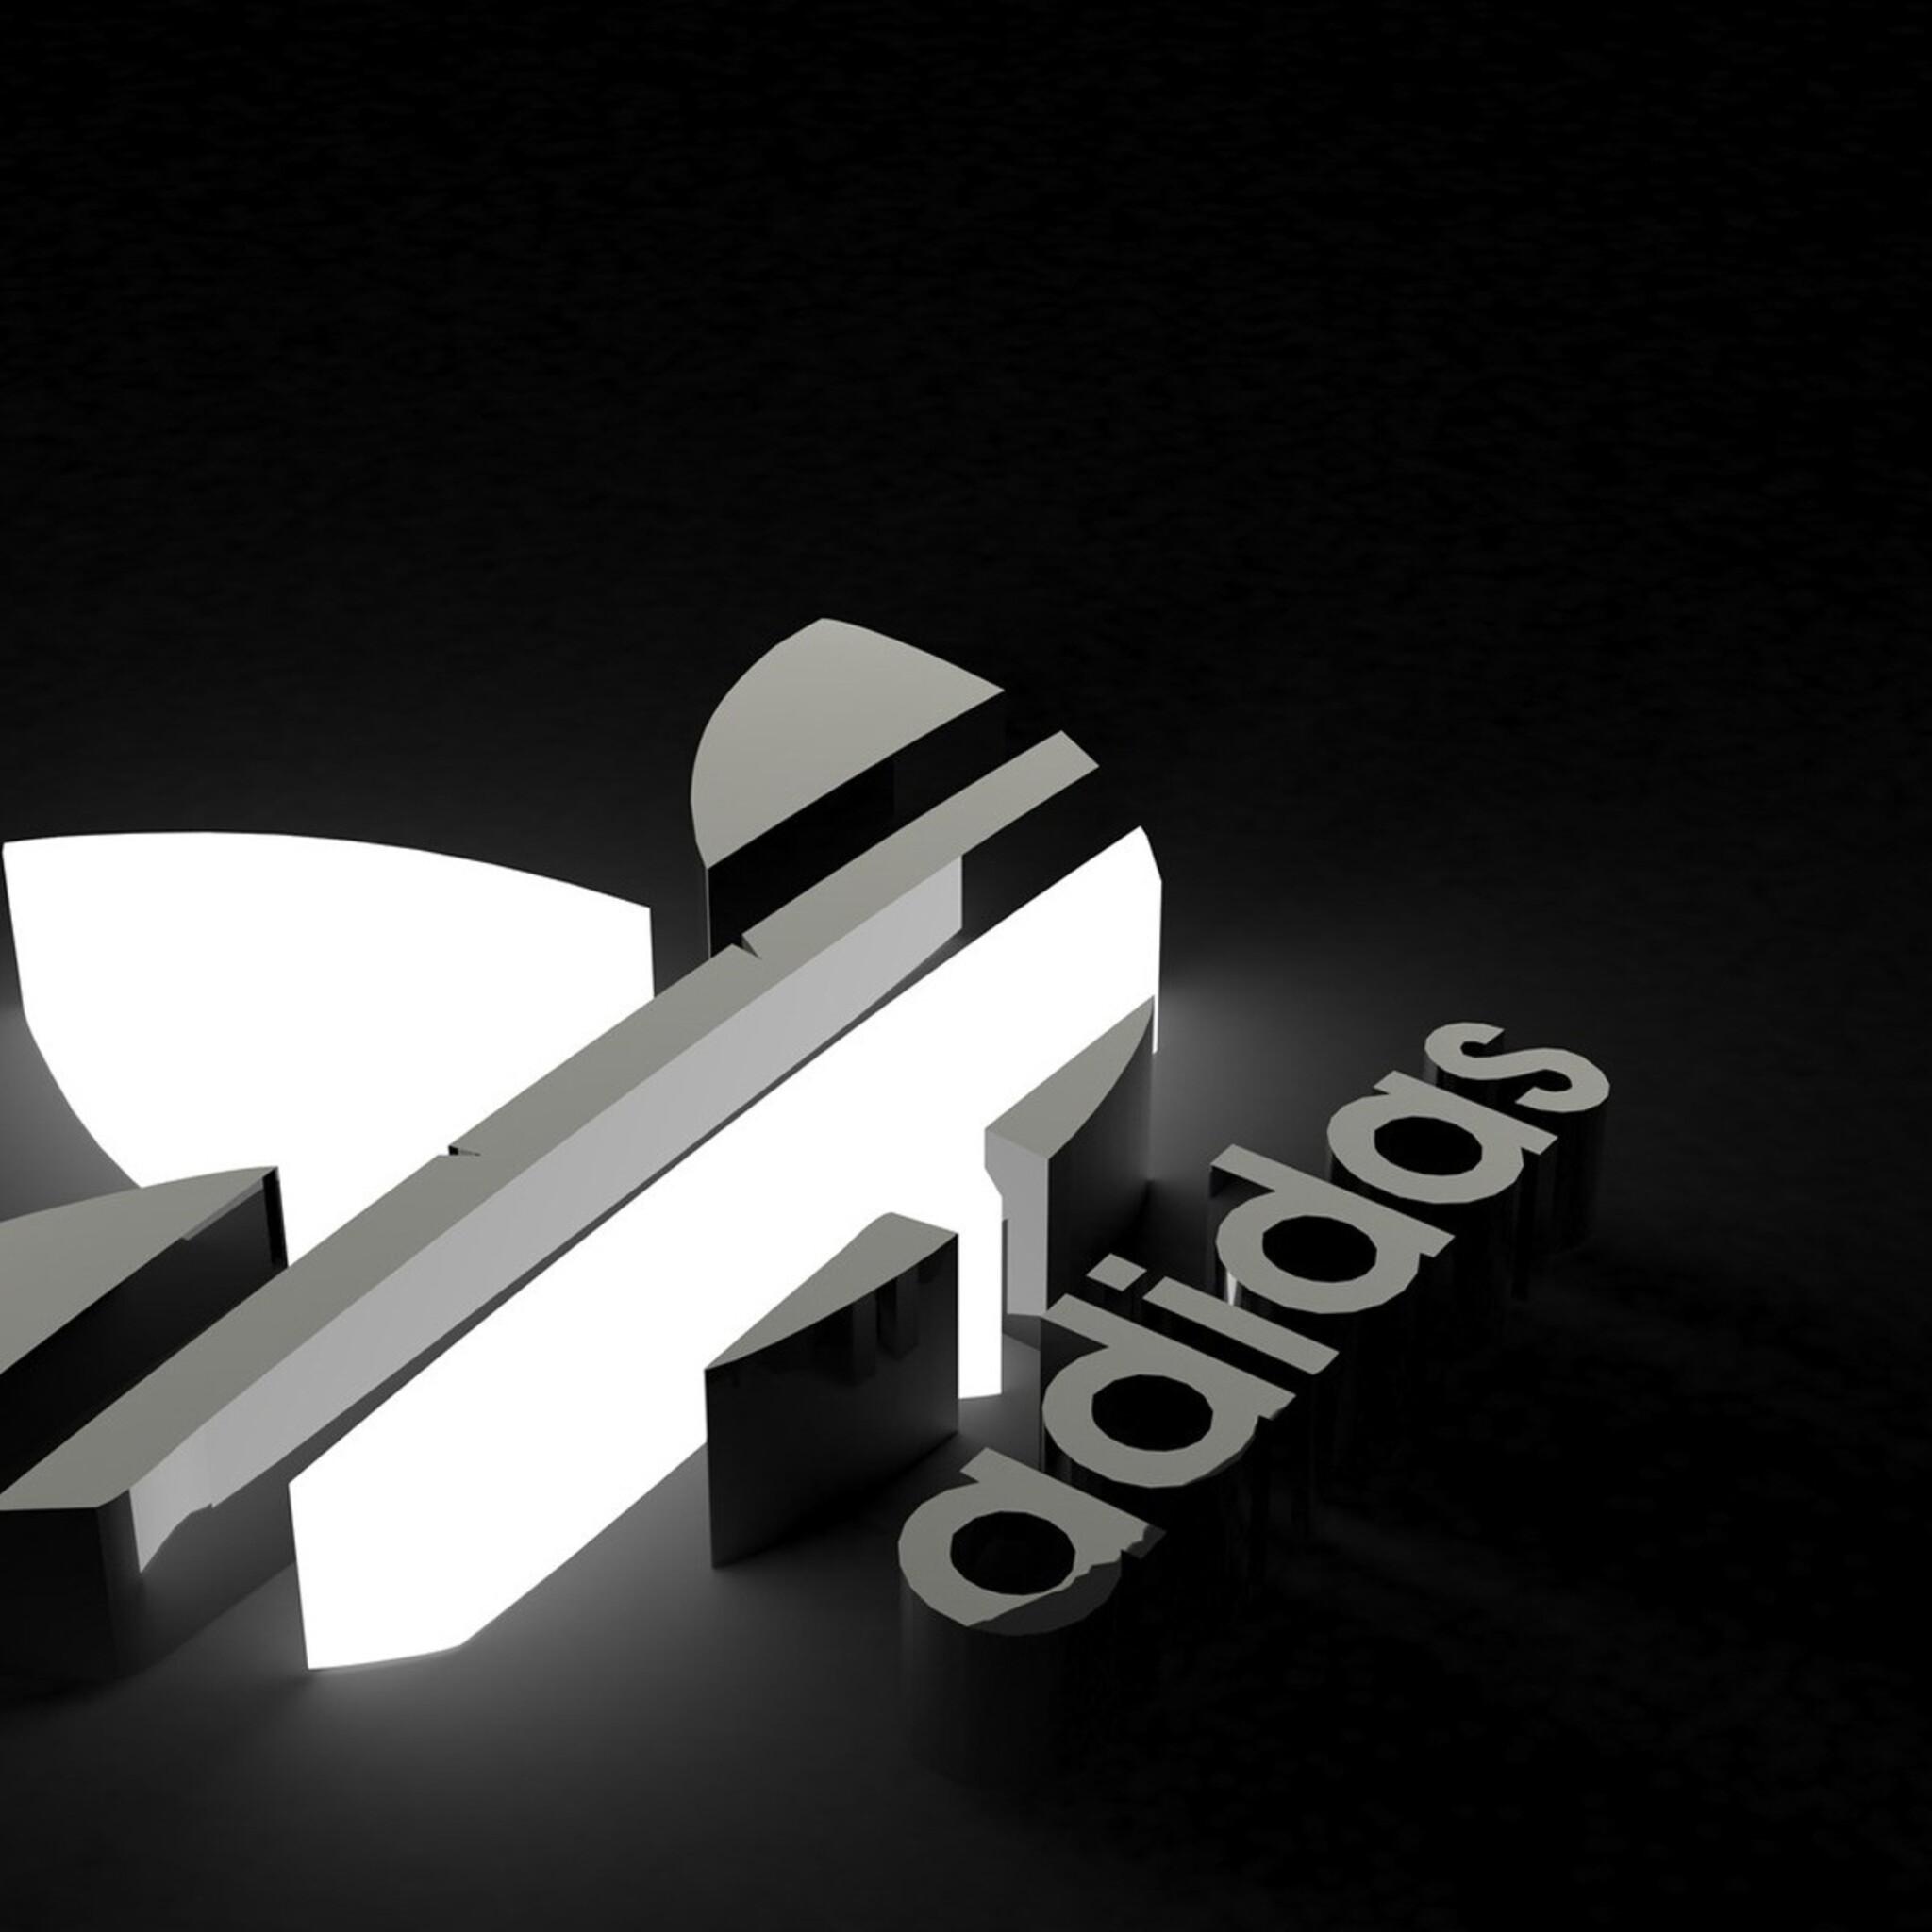 adidas-3d-logo-4k.jpg